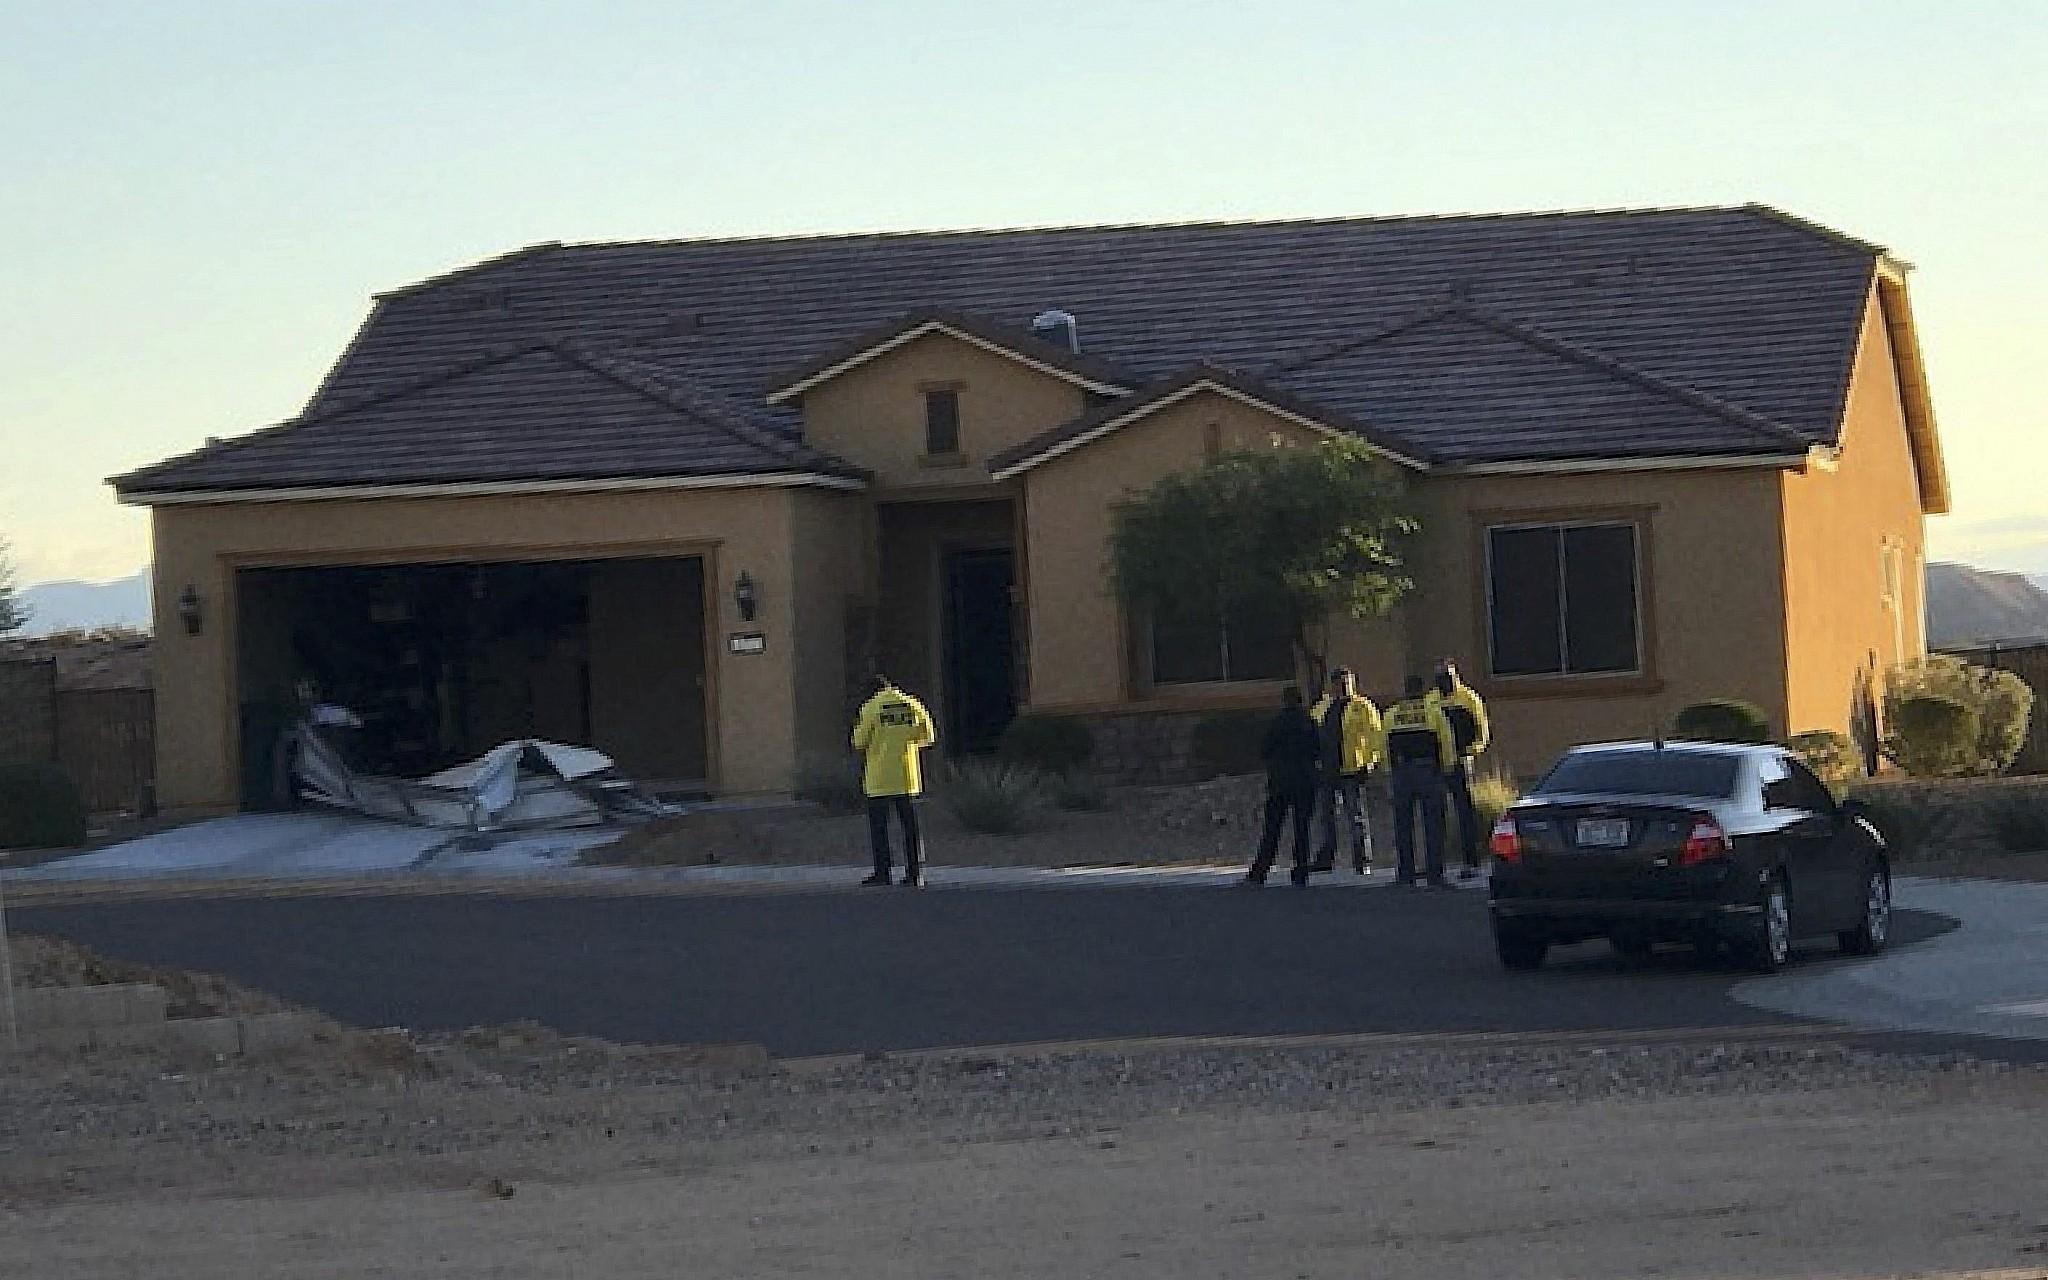 Gun Stocks Jump After Las Vegas Mass Shooting Leaves 50 People Dead